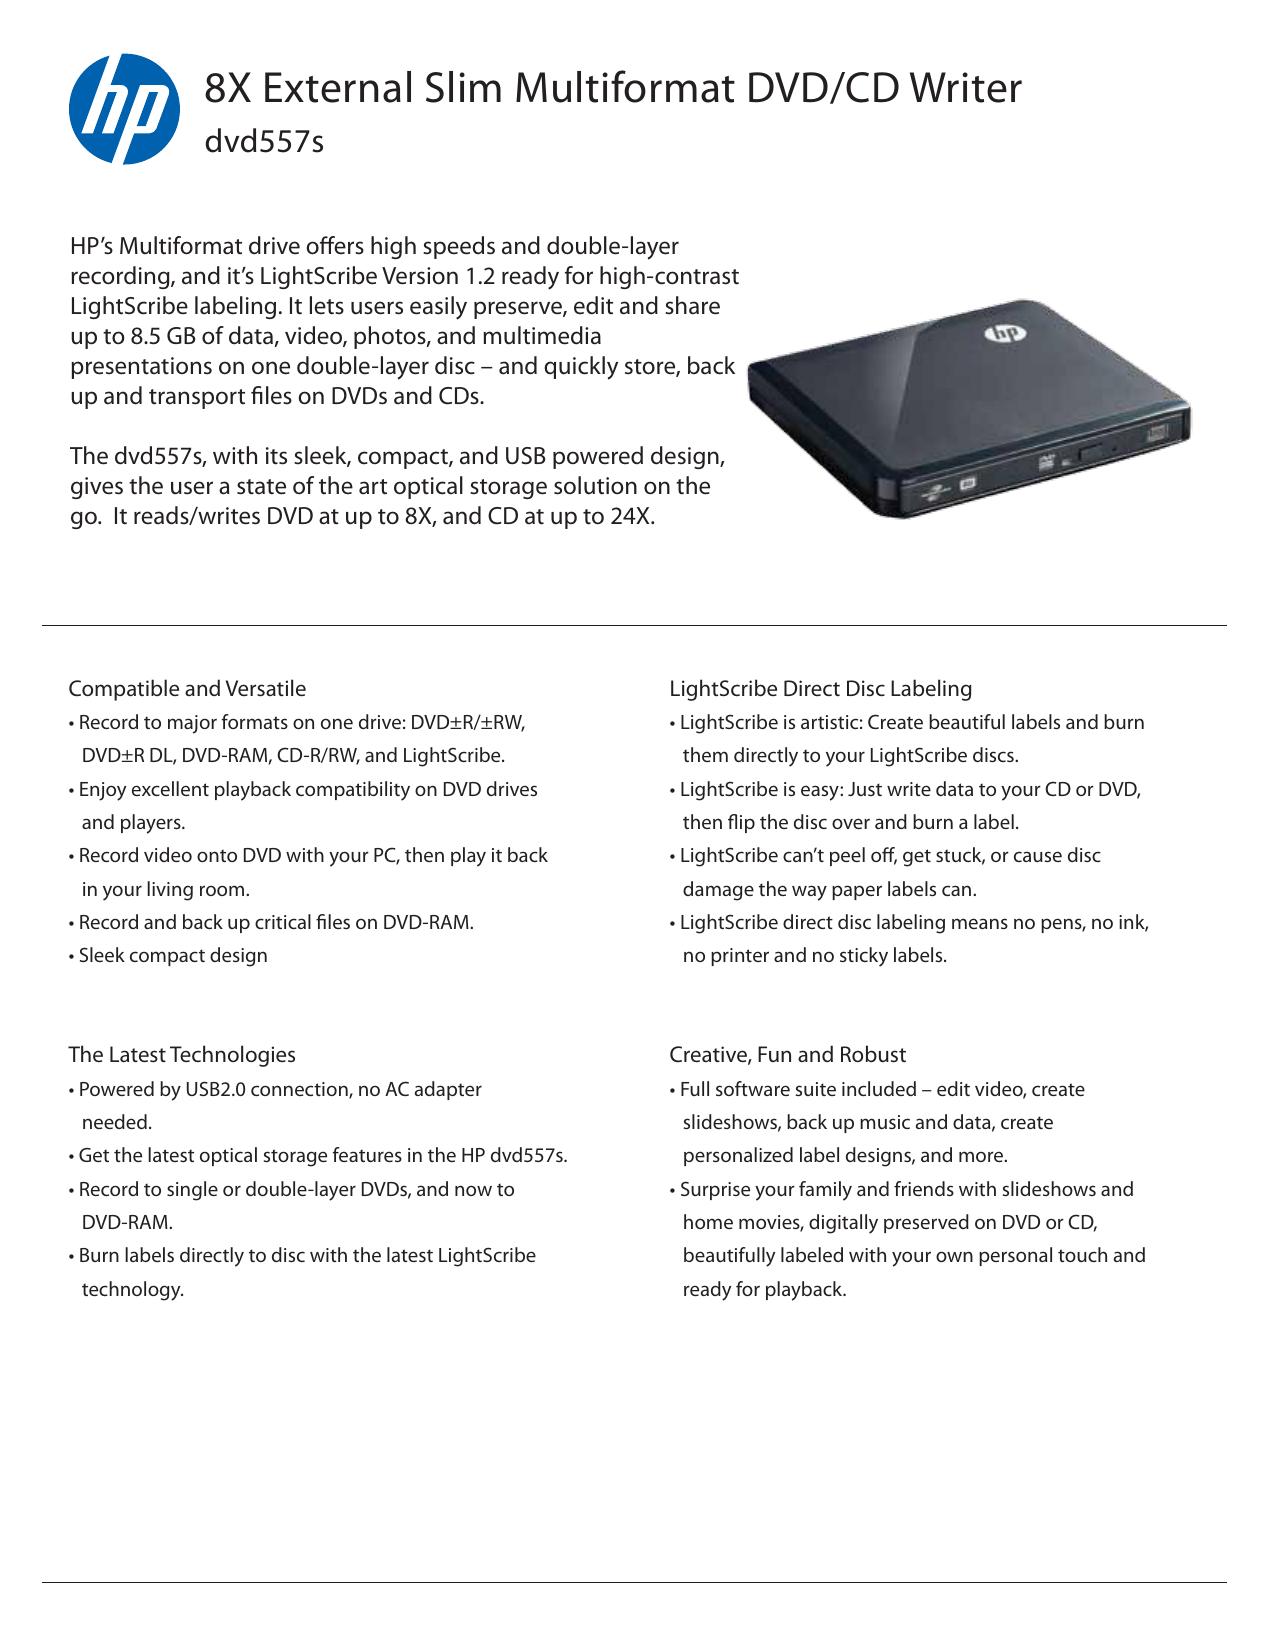 HP DVD557S EXTERNAL DVD-WRITER DRIVER FOR WINDOWS DOWNLOAD